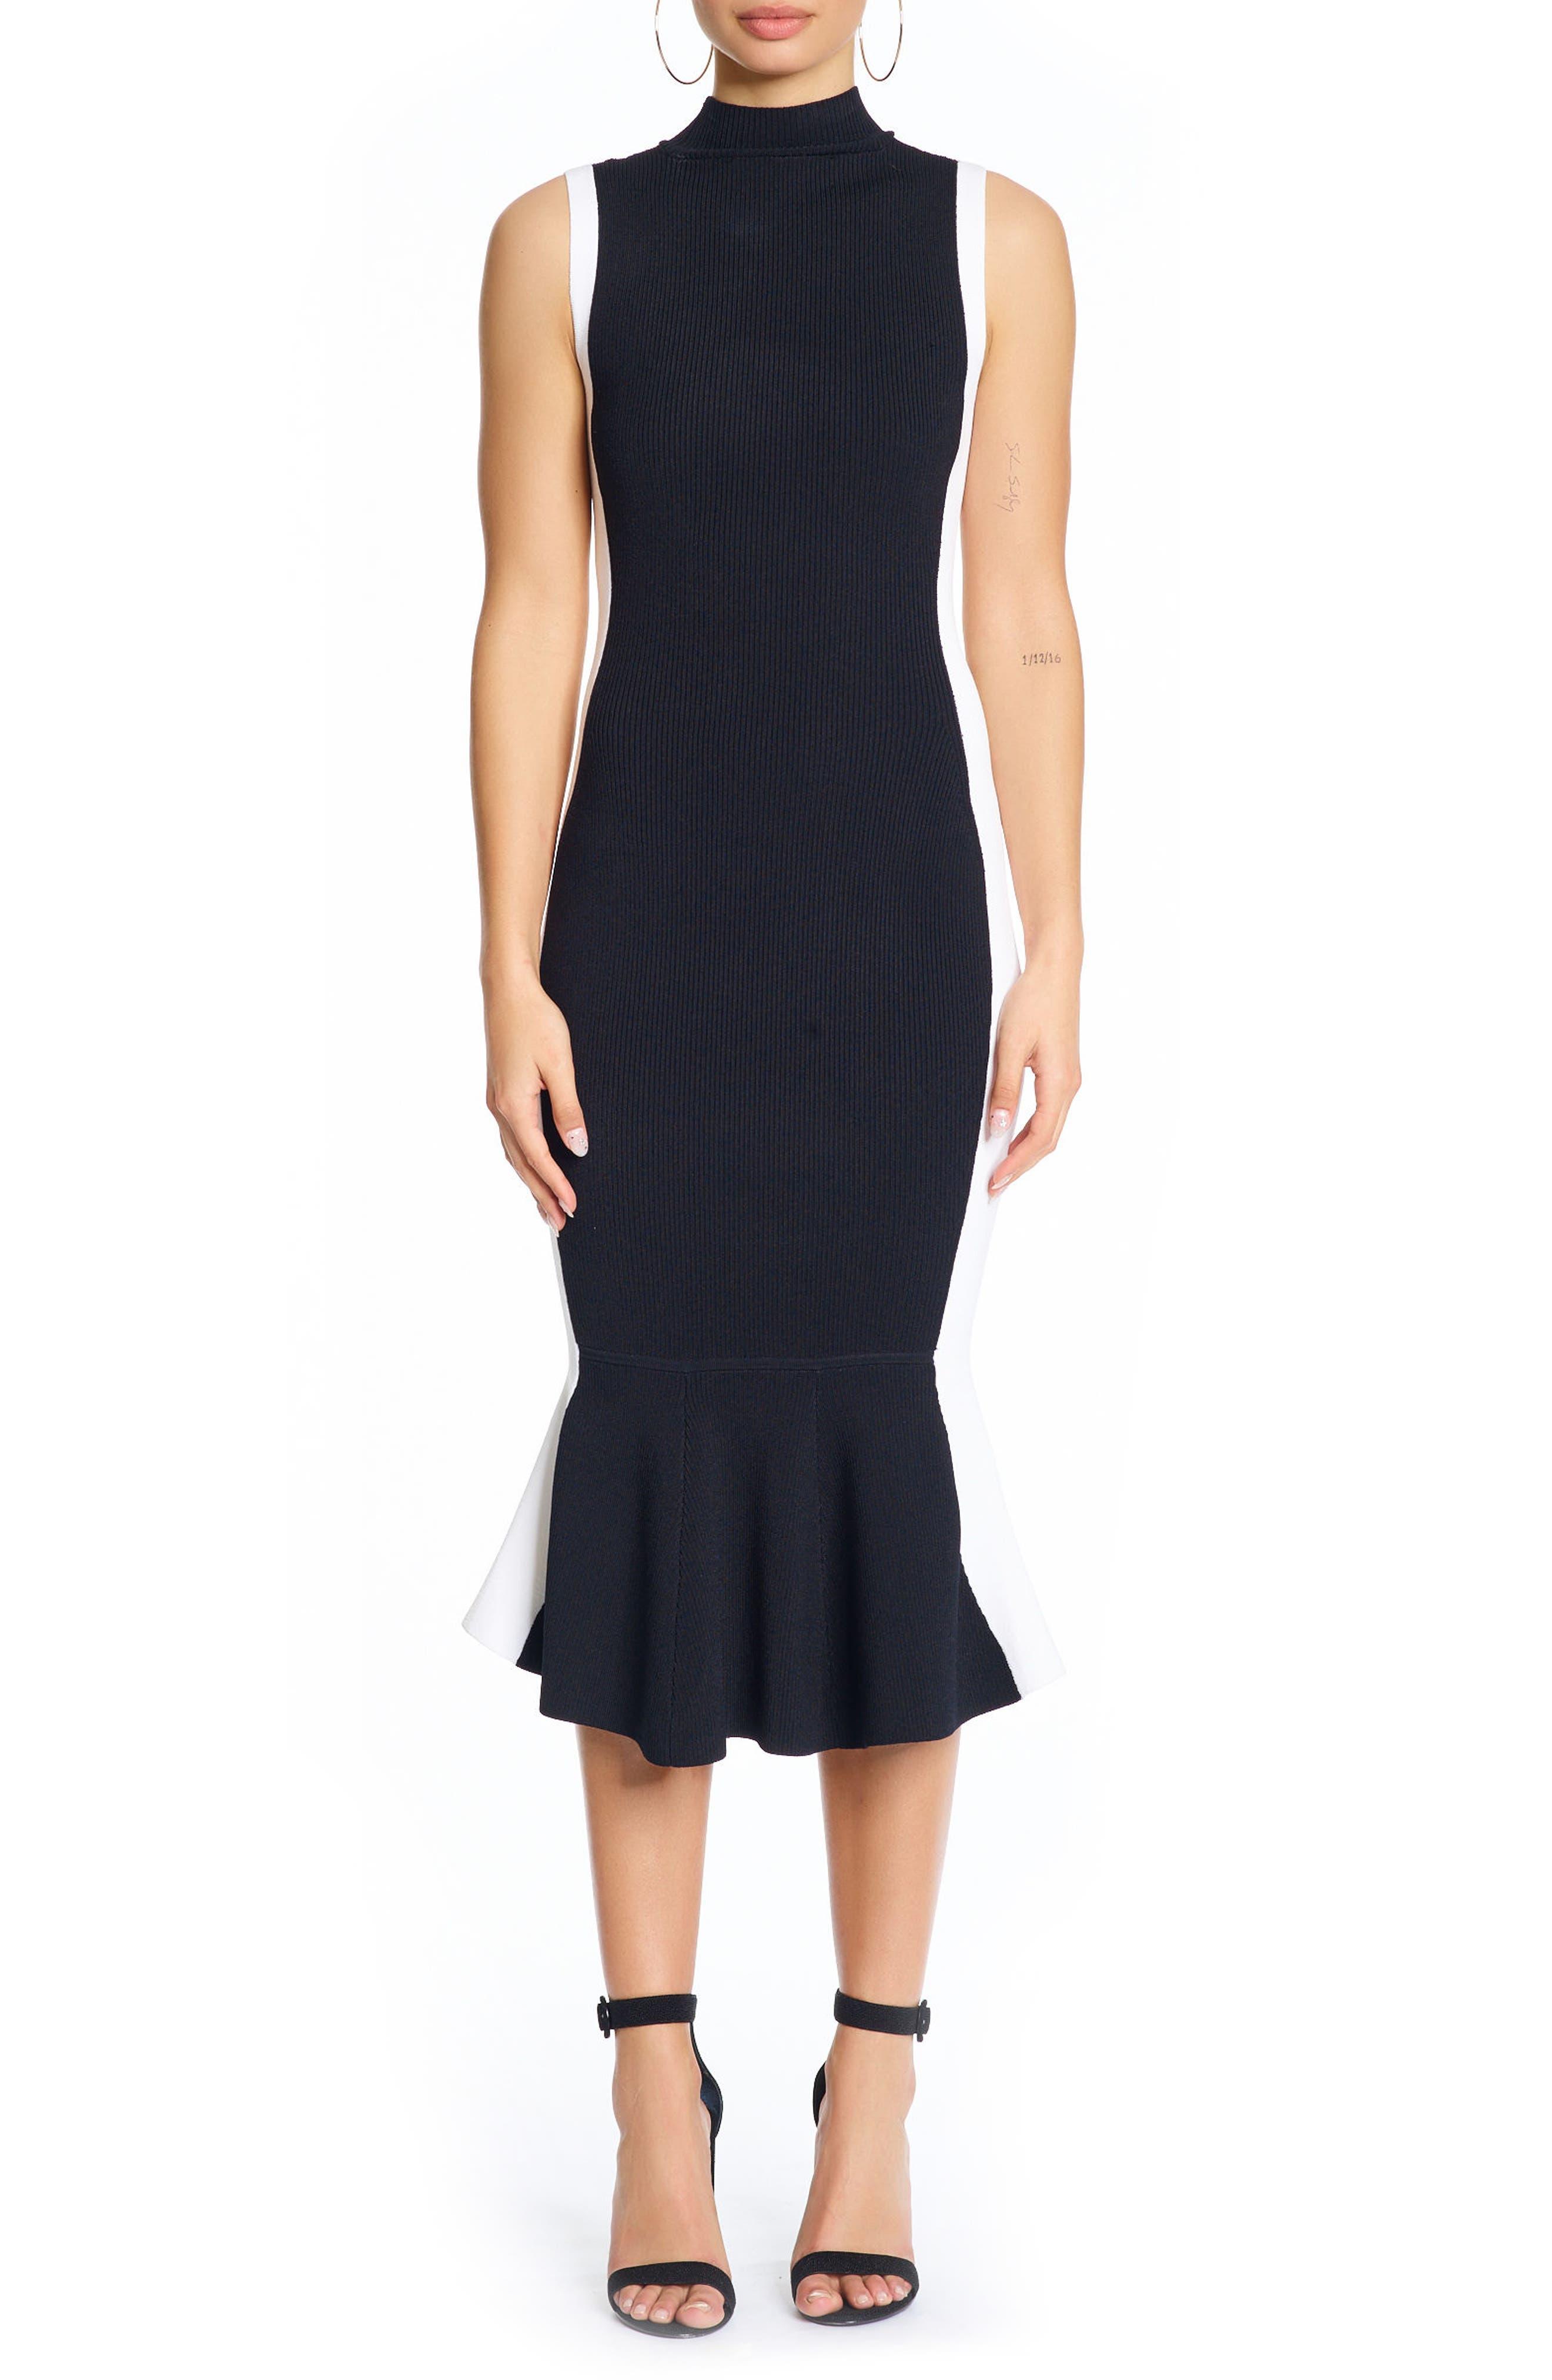 Illusion Peplum Dress,                         Main,                         color, Black/ Bright White